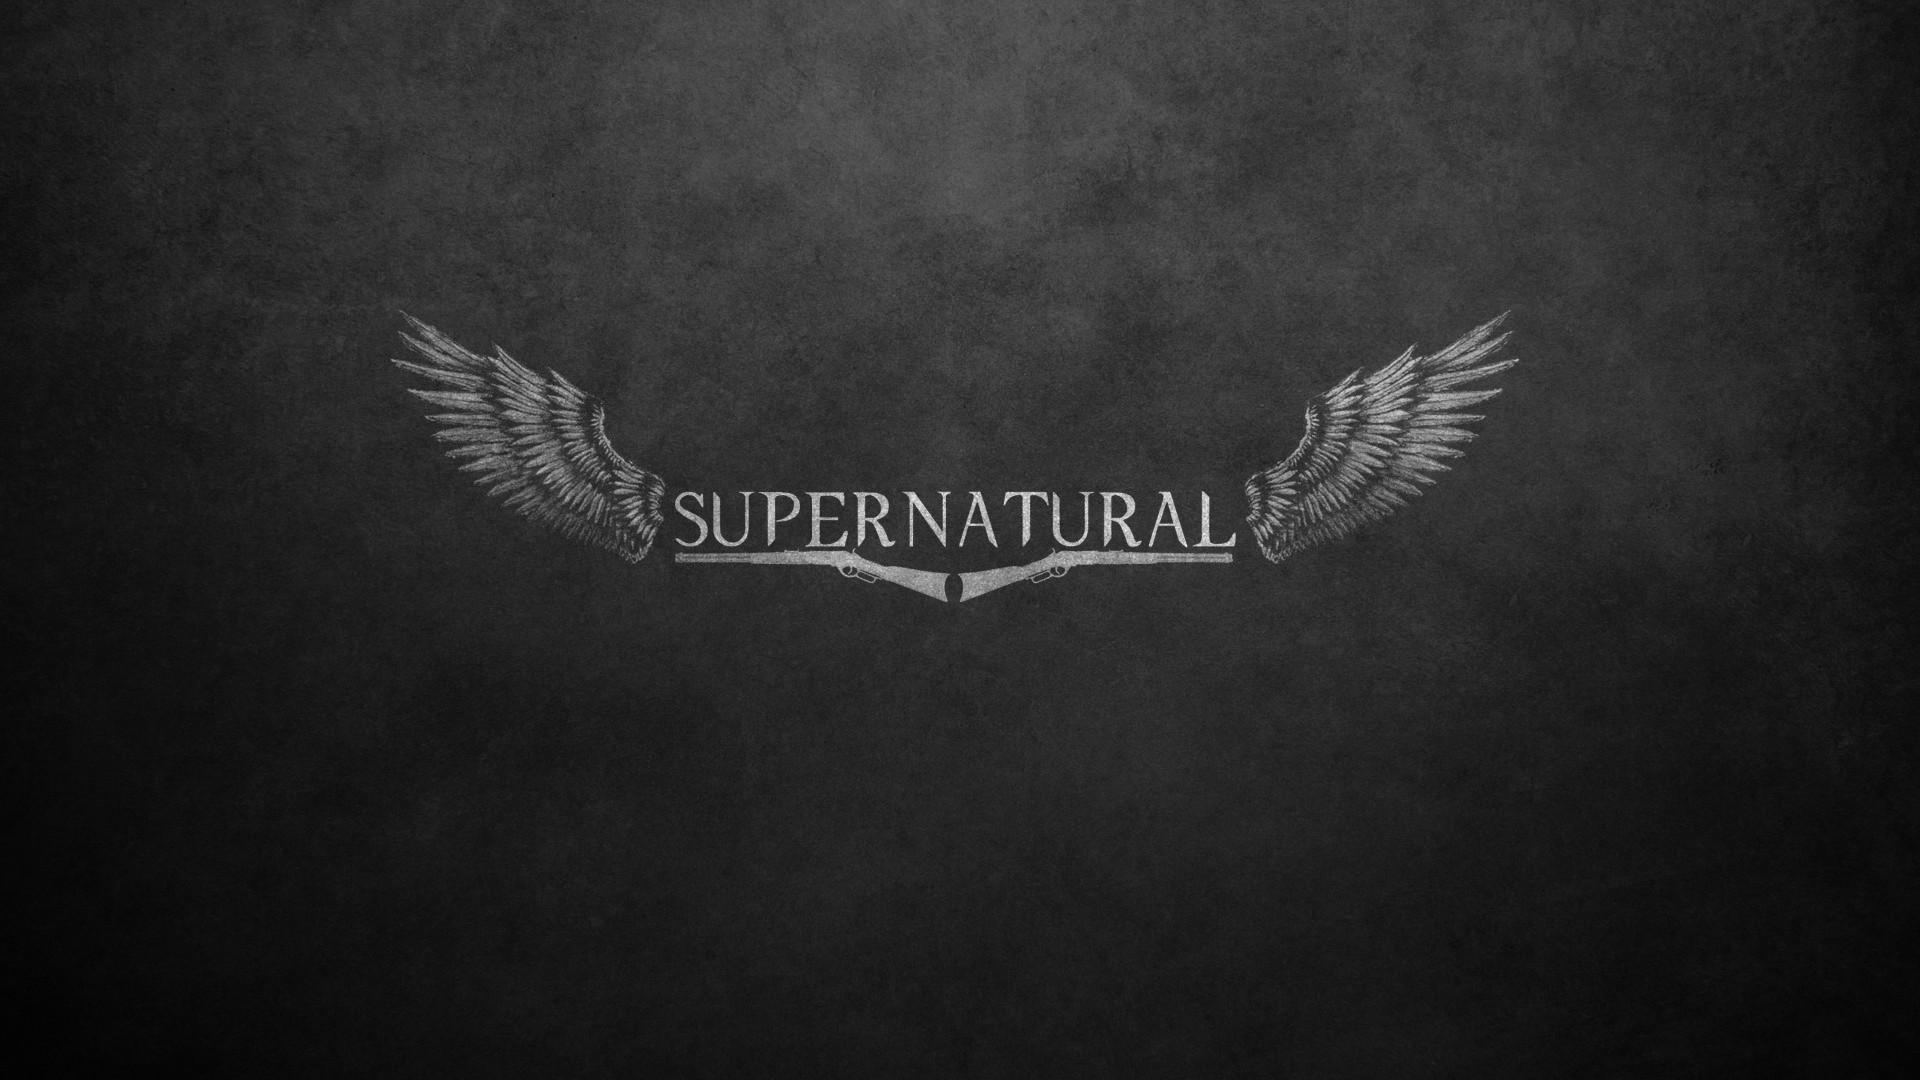 Supernatural Wallpapers Top Free Supernatural Backgrounds